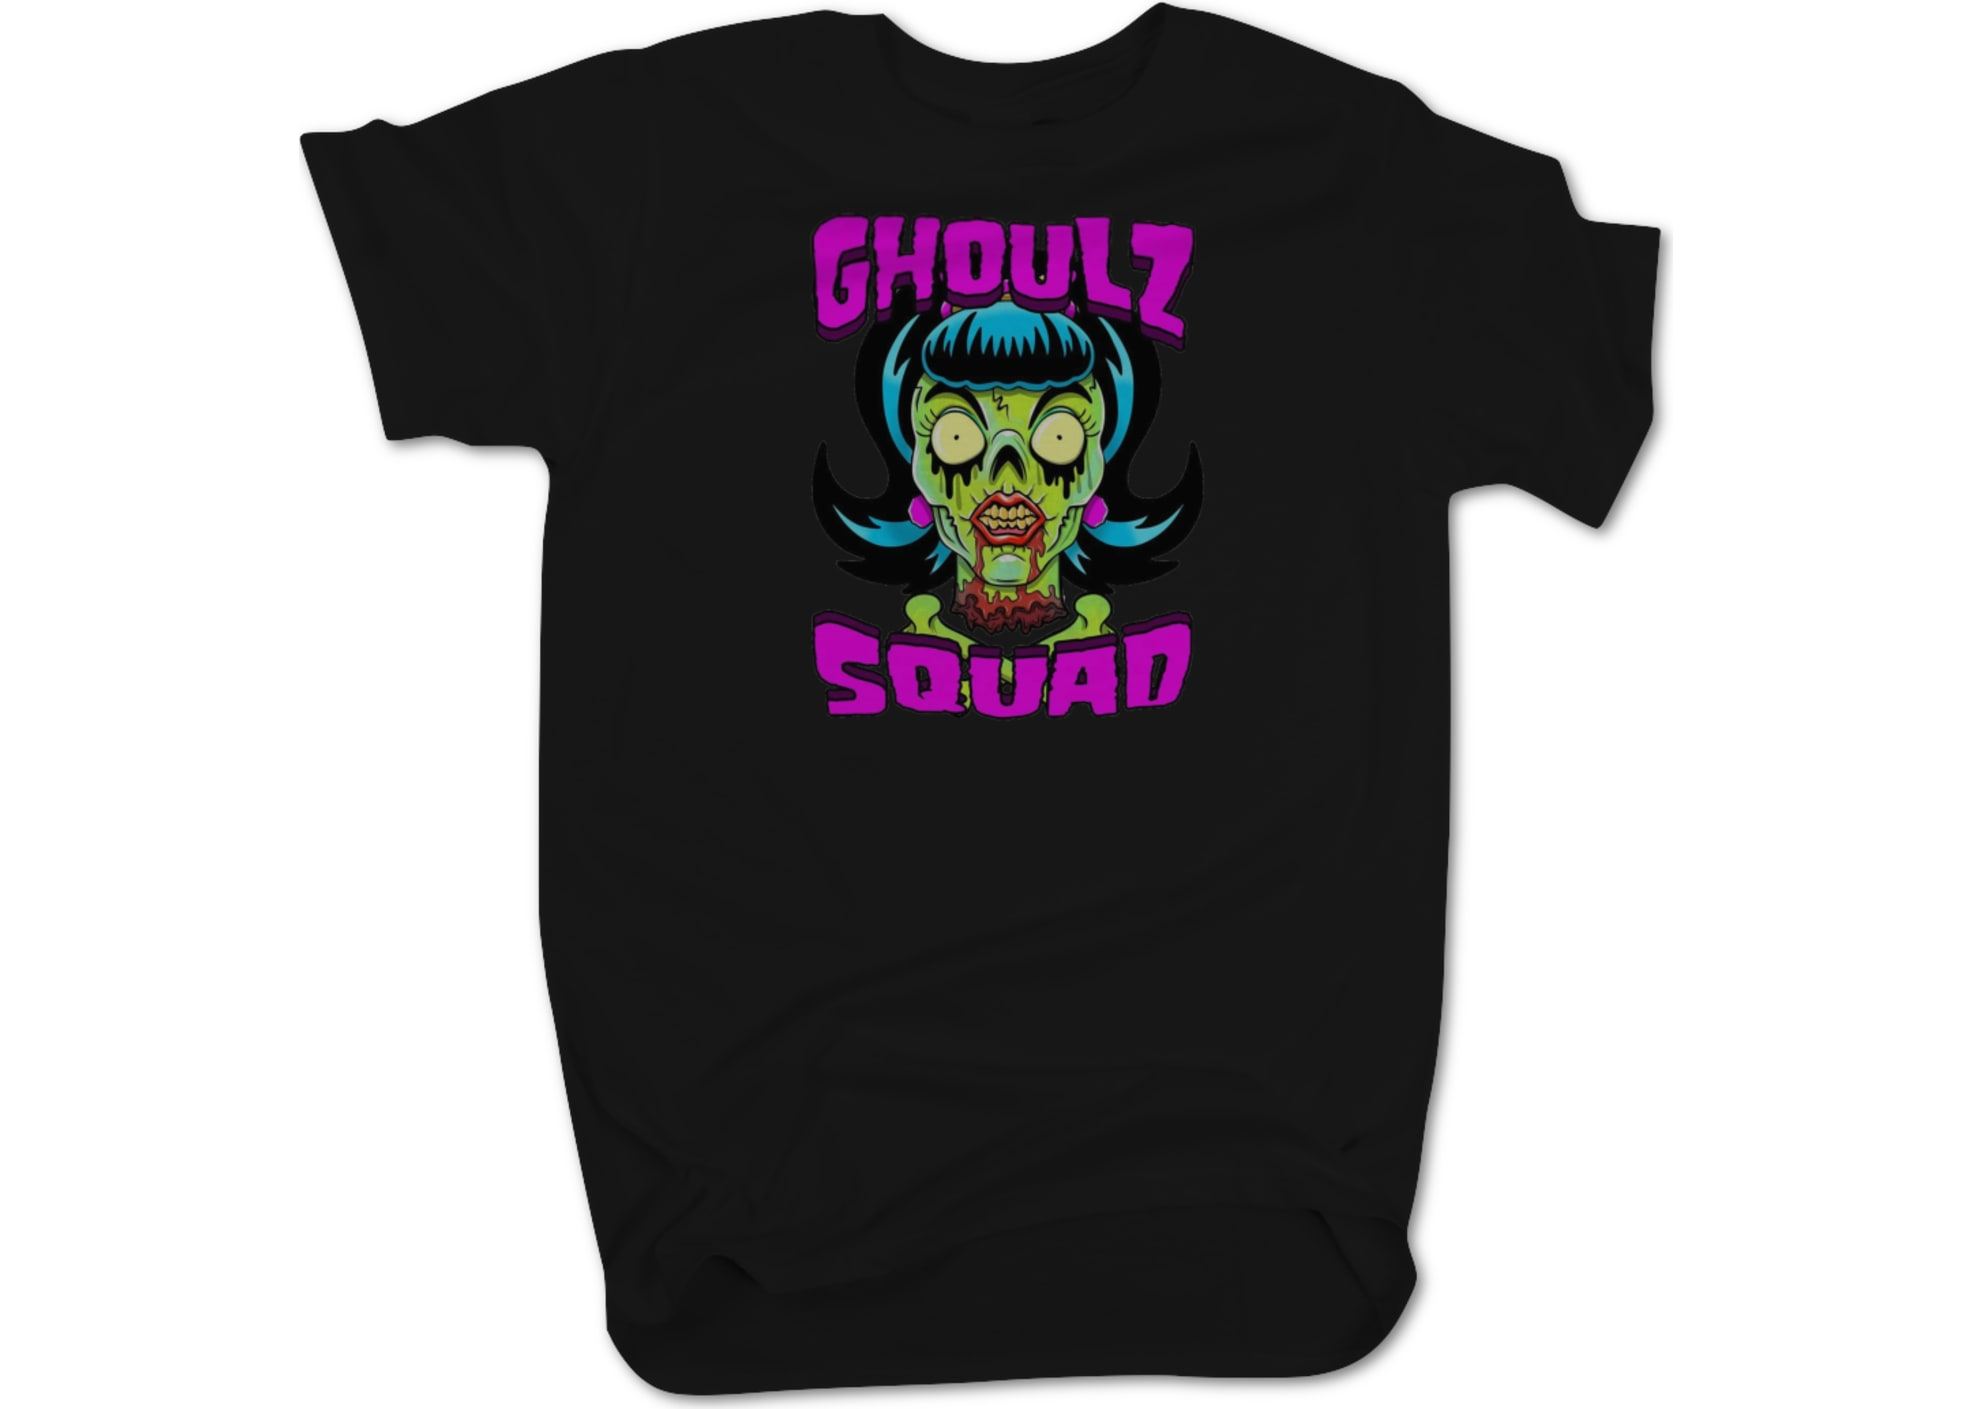 Ghozt tha dmented ghozt female fan shirt  black  1595802684